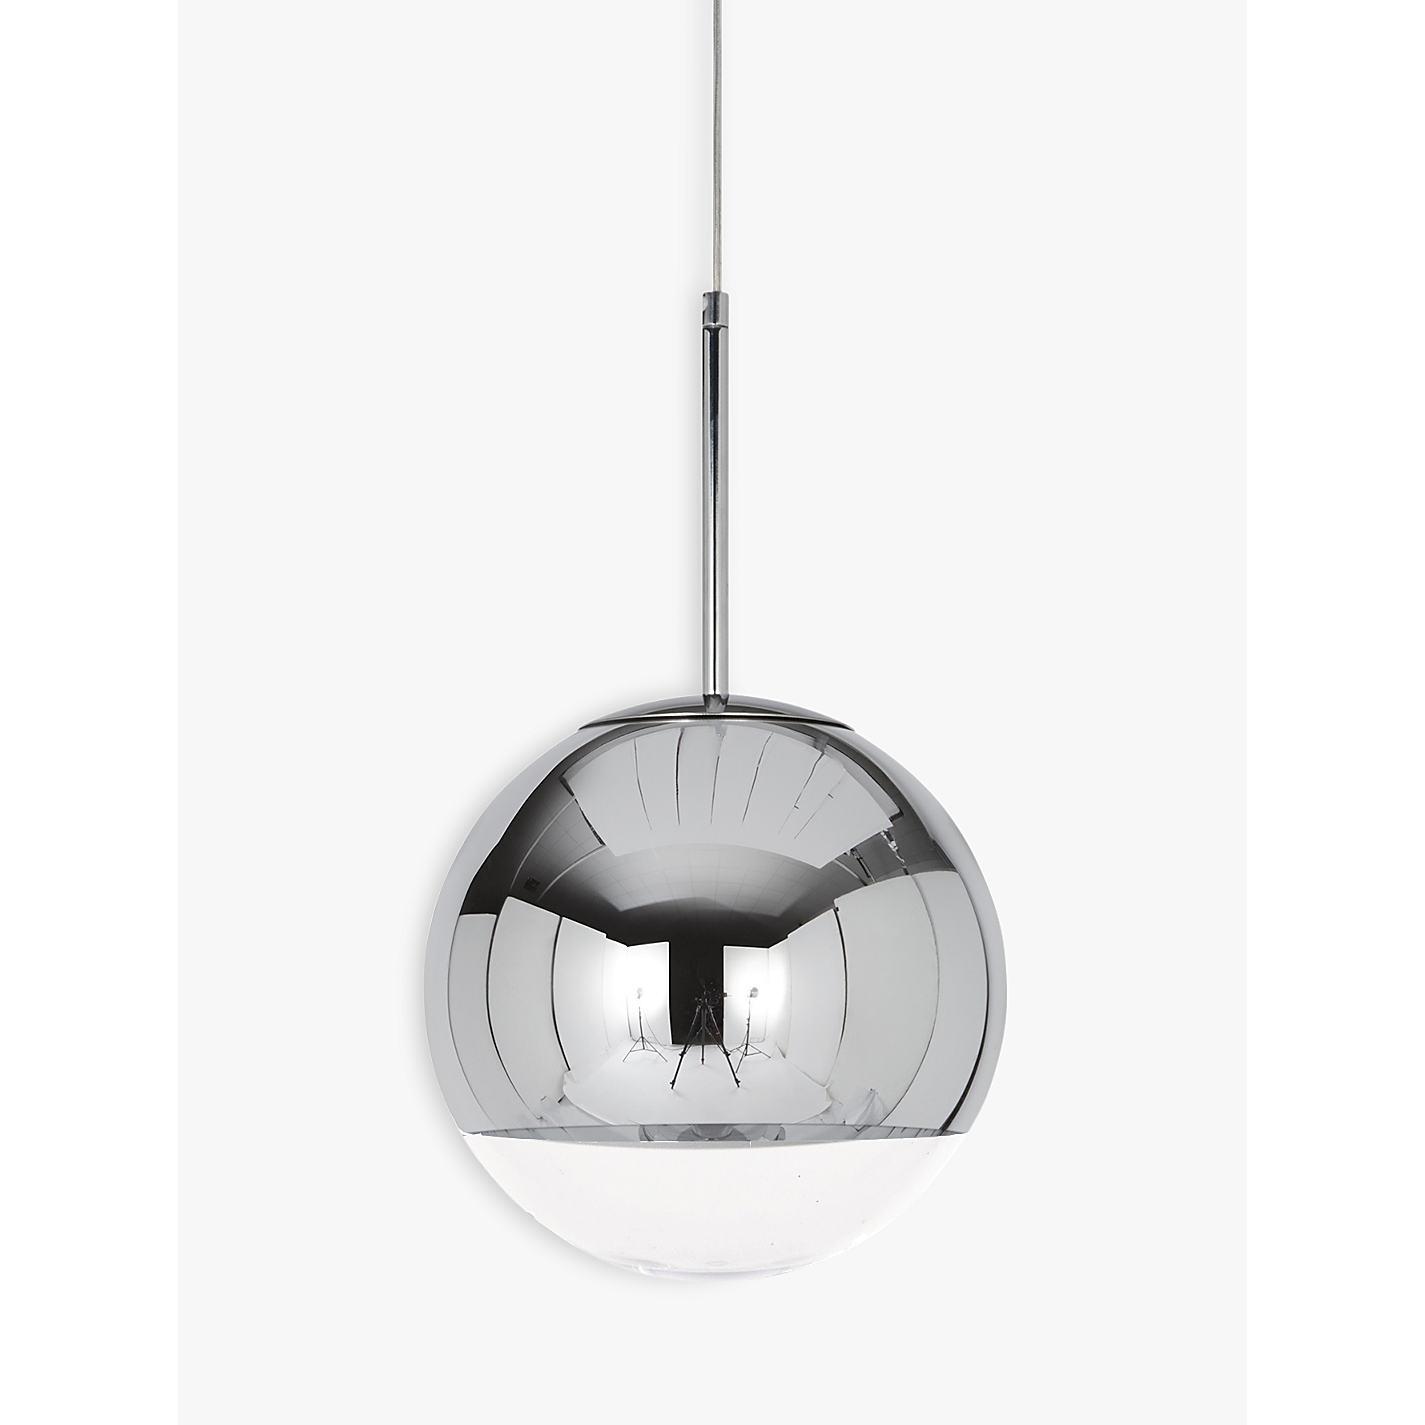 Buy tom dixon mirror ball pendant light large john lewis buy tom dixon mirror ball pendant light large online at johnlewis mozeypictures Choice Image